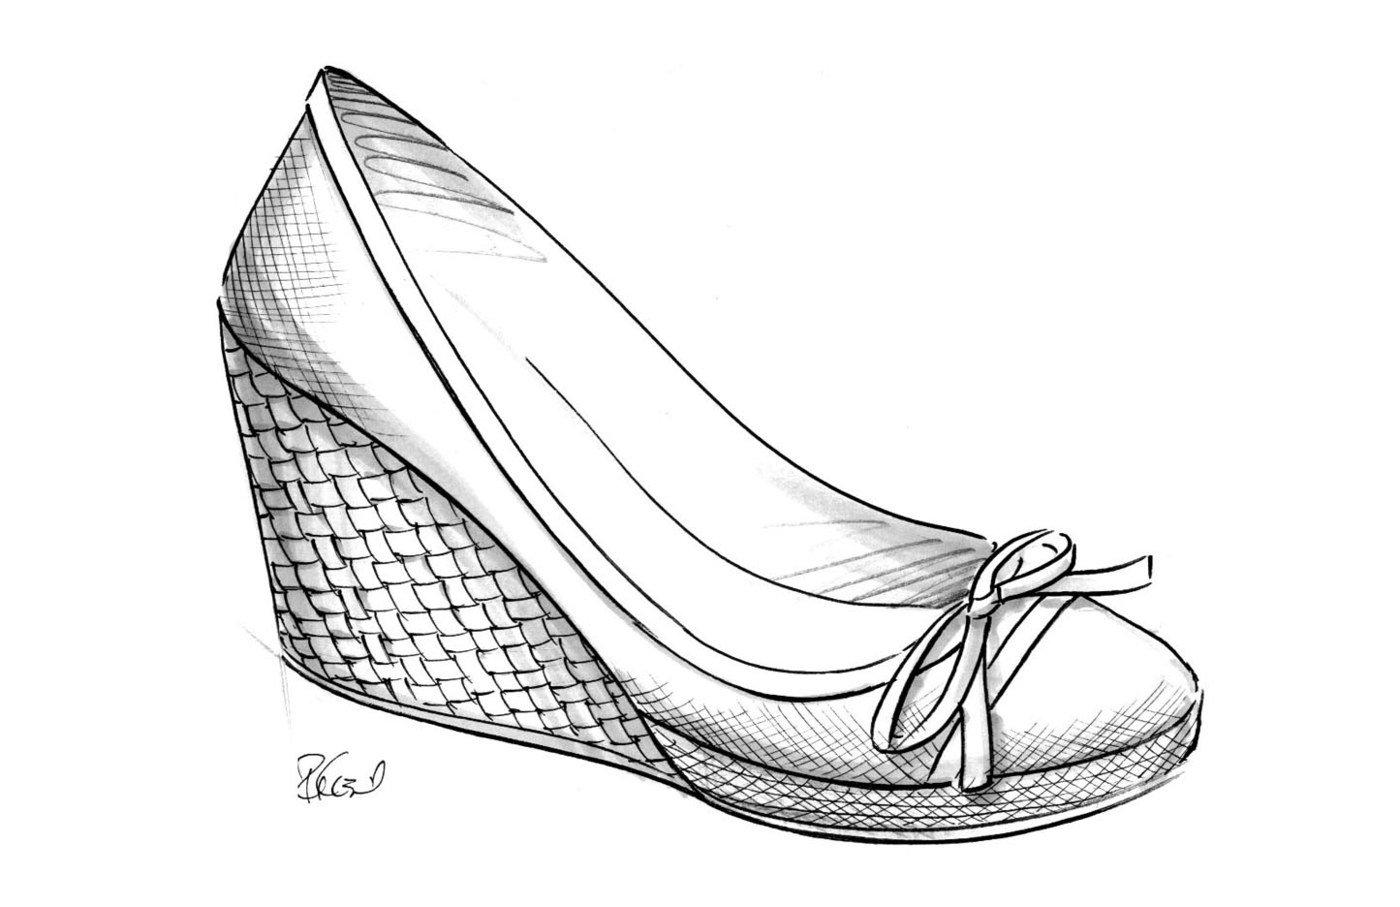 Comfort Casual Footwear By Robert Klein At Coroflot